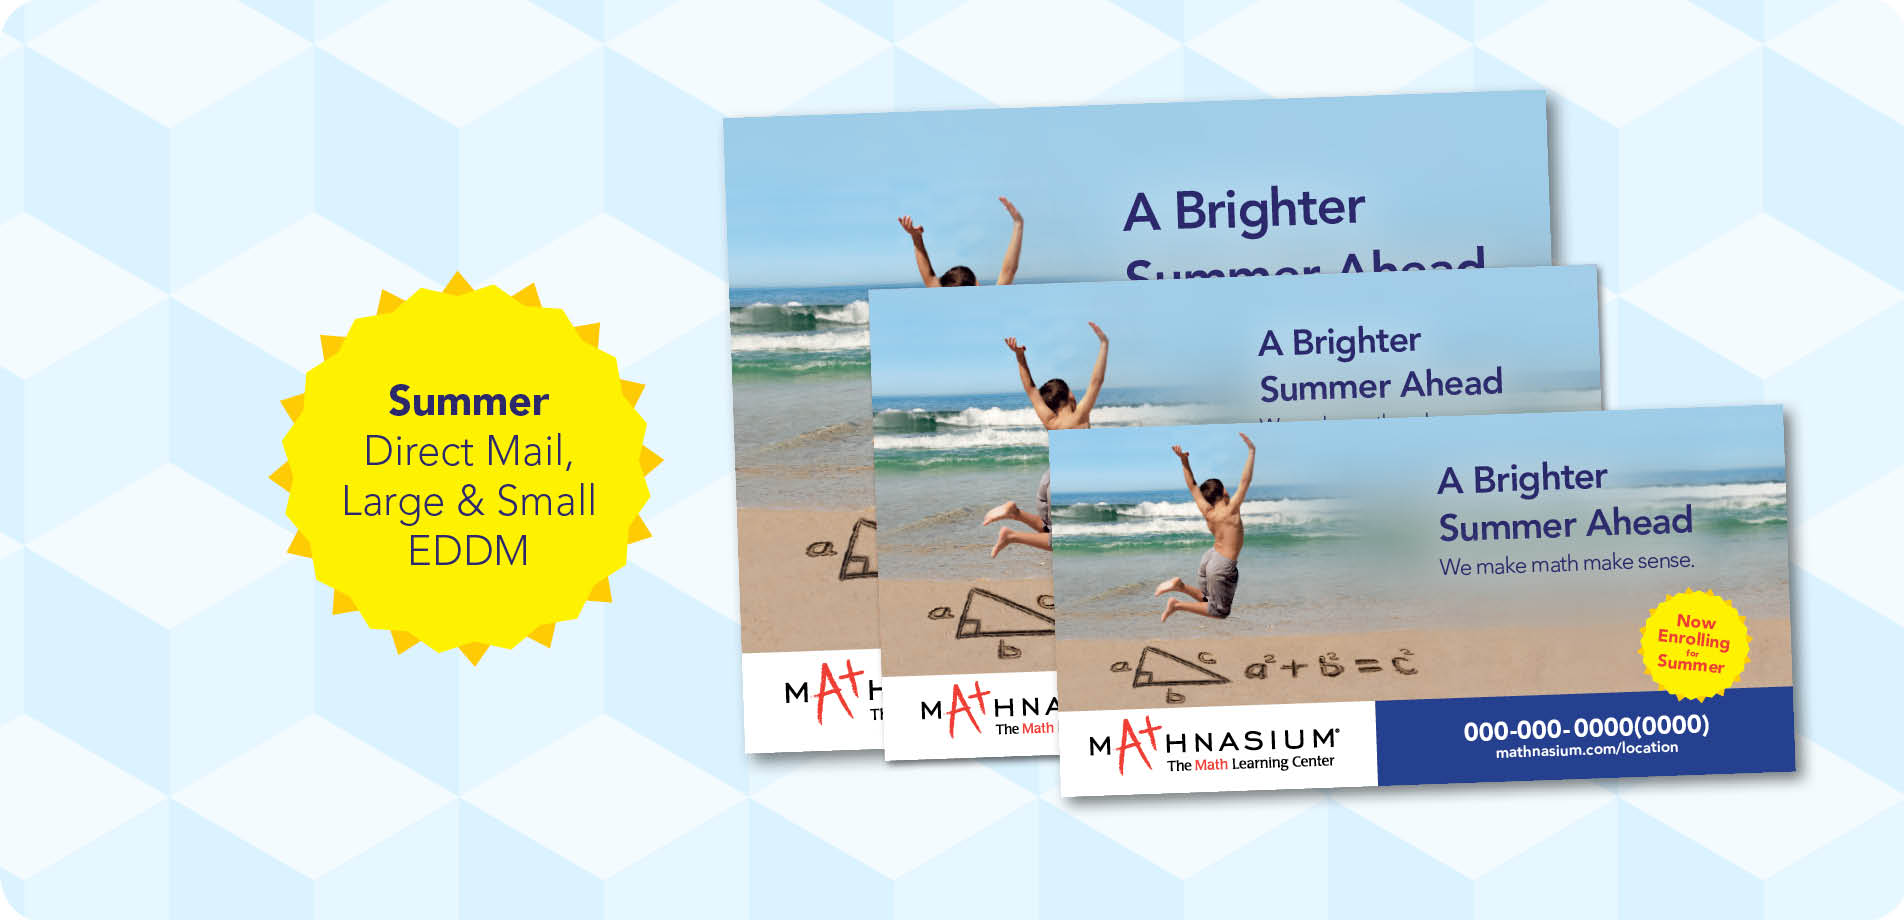 Sample-Email-Summer-Beach-Direct-Mail-EDDM-2016